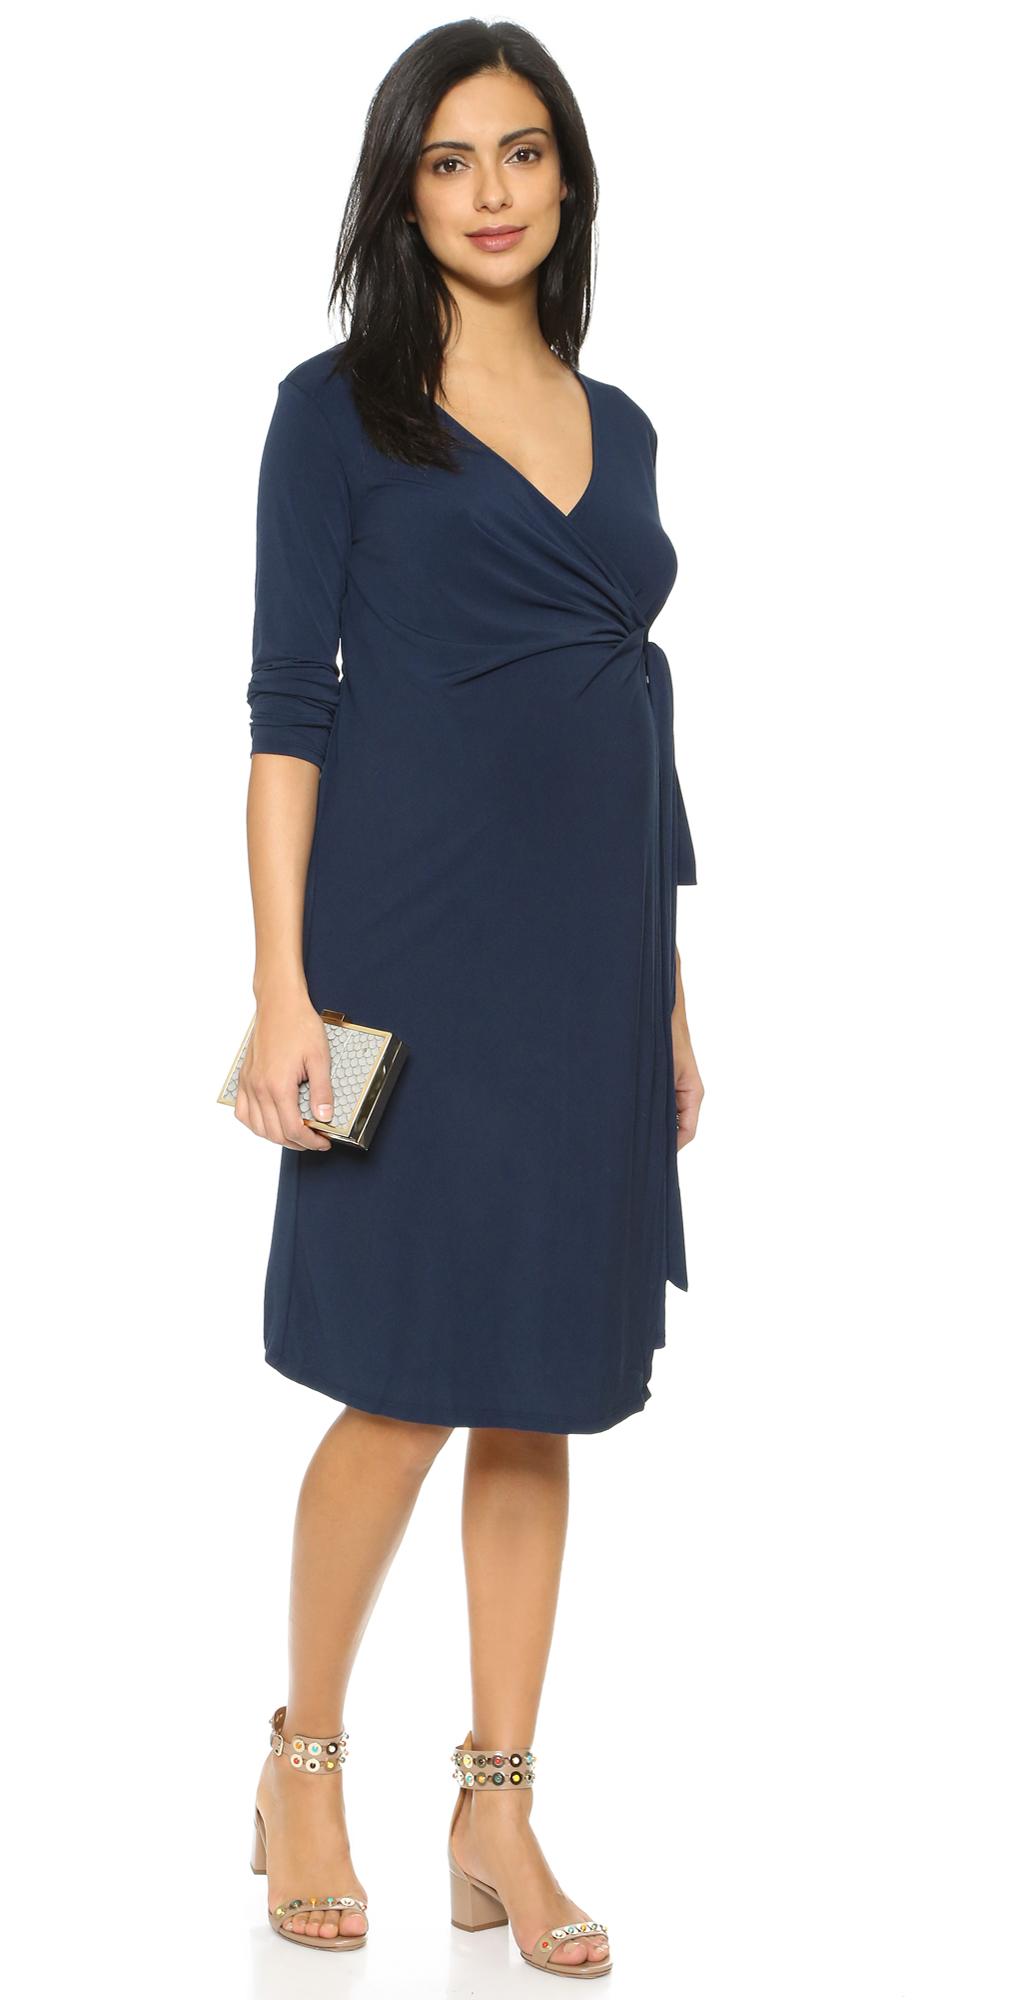 Rosie pope maternity wrap dress shopbop rosie pope maternity wrap dress ombrellifo Images